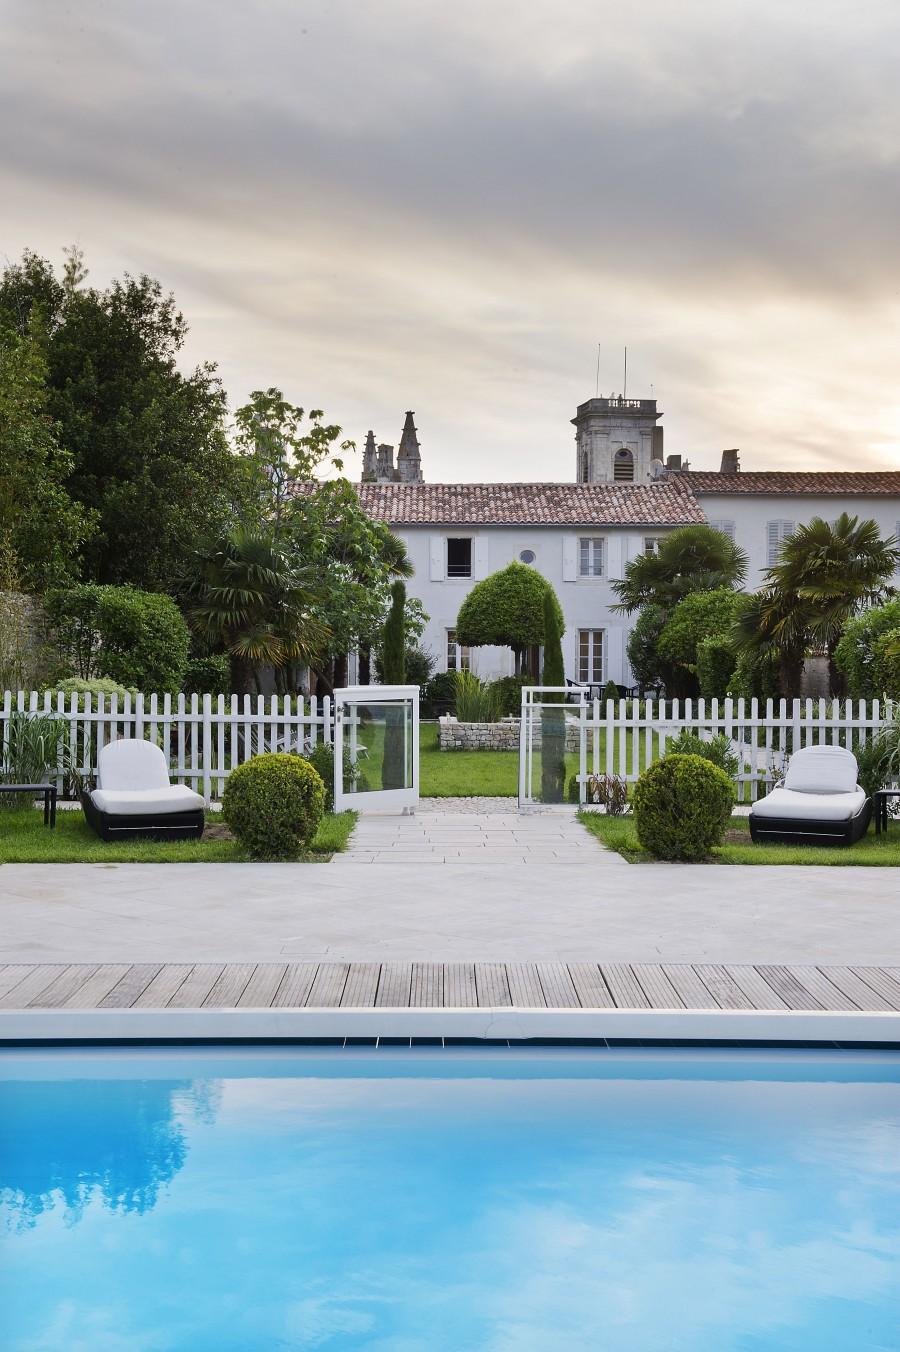 Villa clarisse hotel ile de r france europe luxury for Villa ile de re